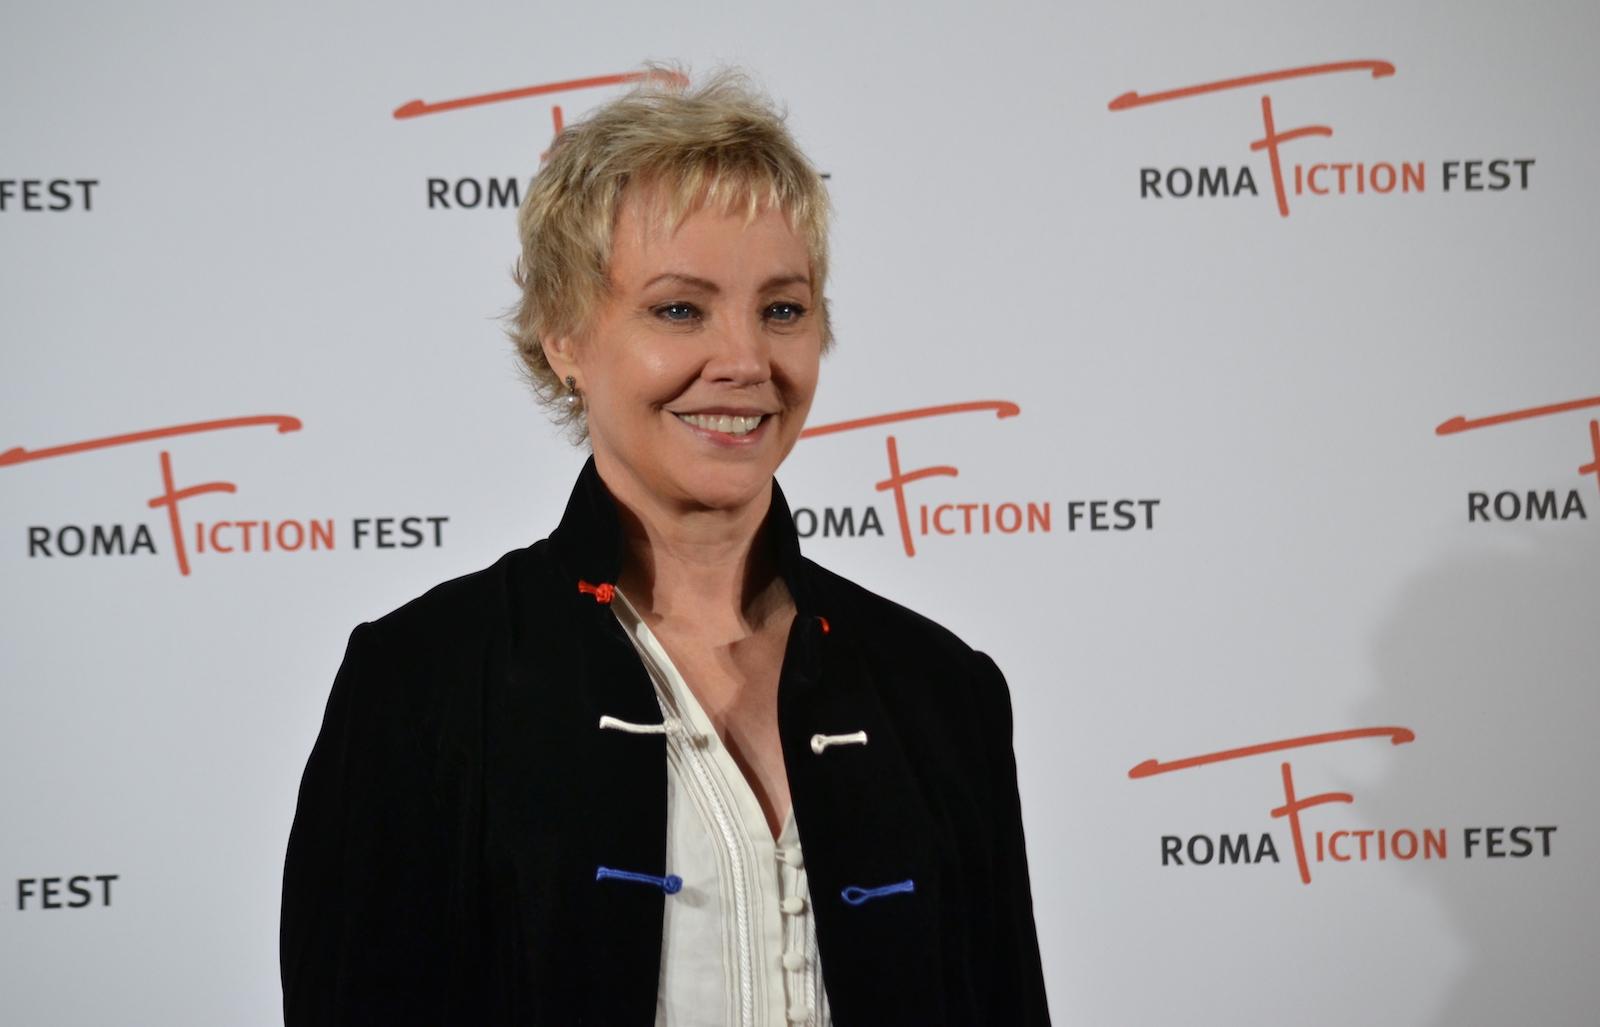 Roma Fiction Fest 2015: Carole André sorride sul red carpet di Sandokan